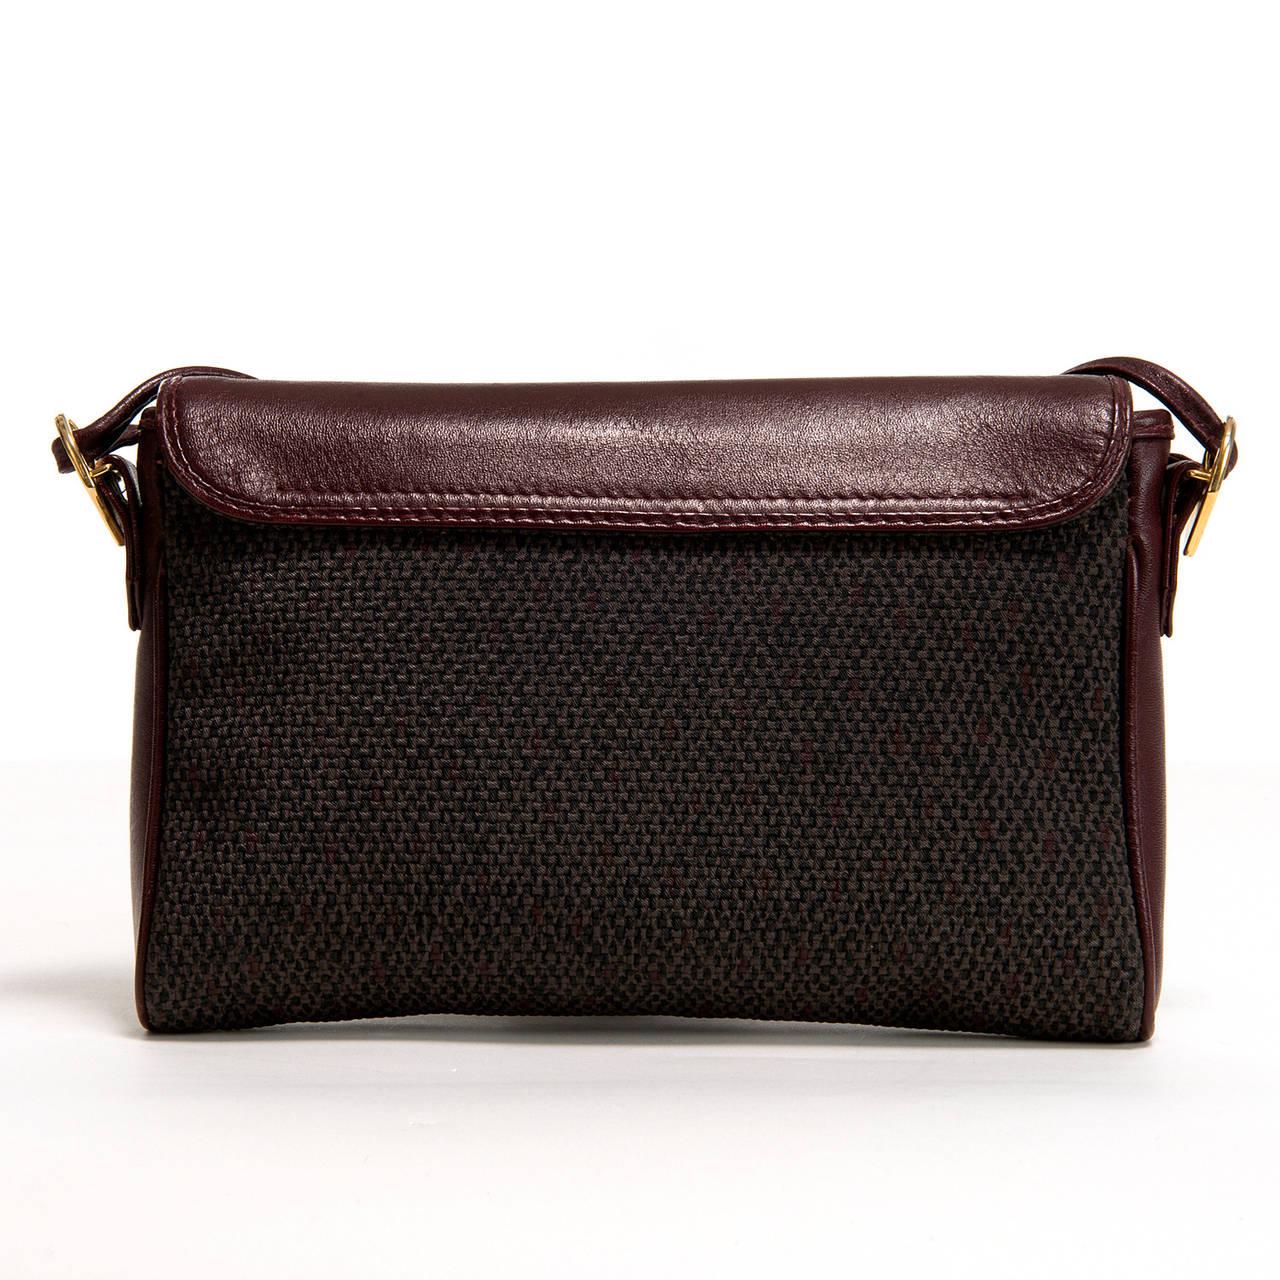 Yves Saint Laurent Burgundy/Grey Toile Cross-Body Bag 2